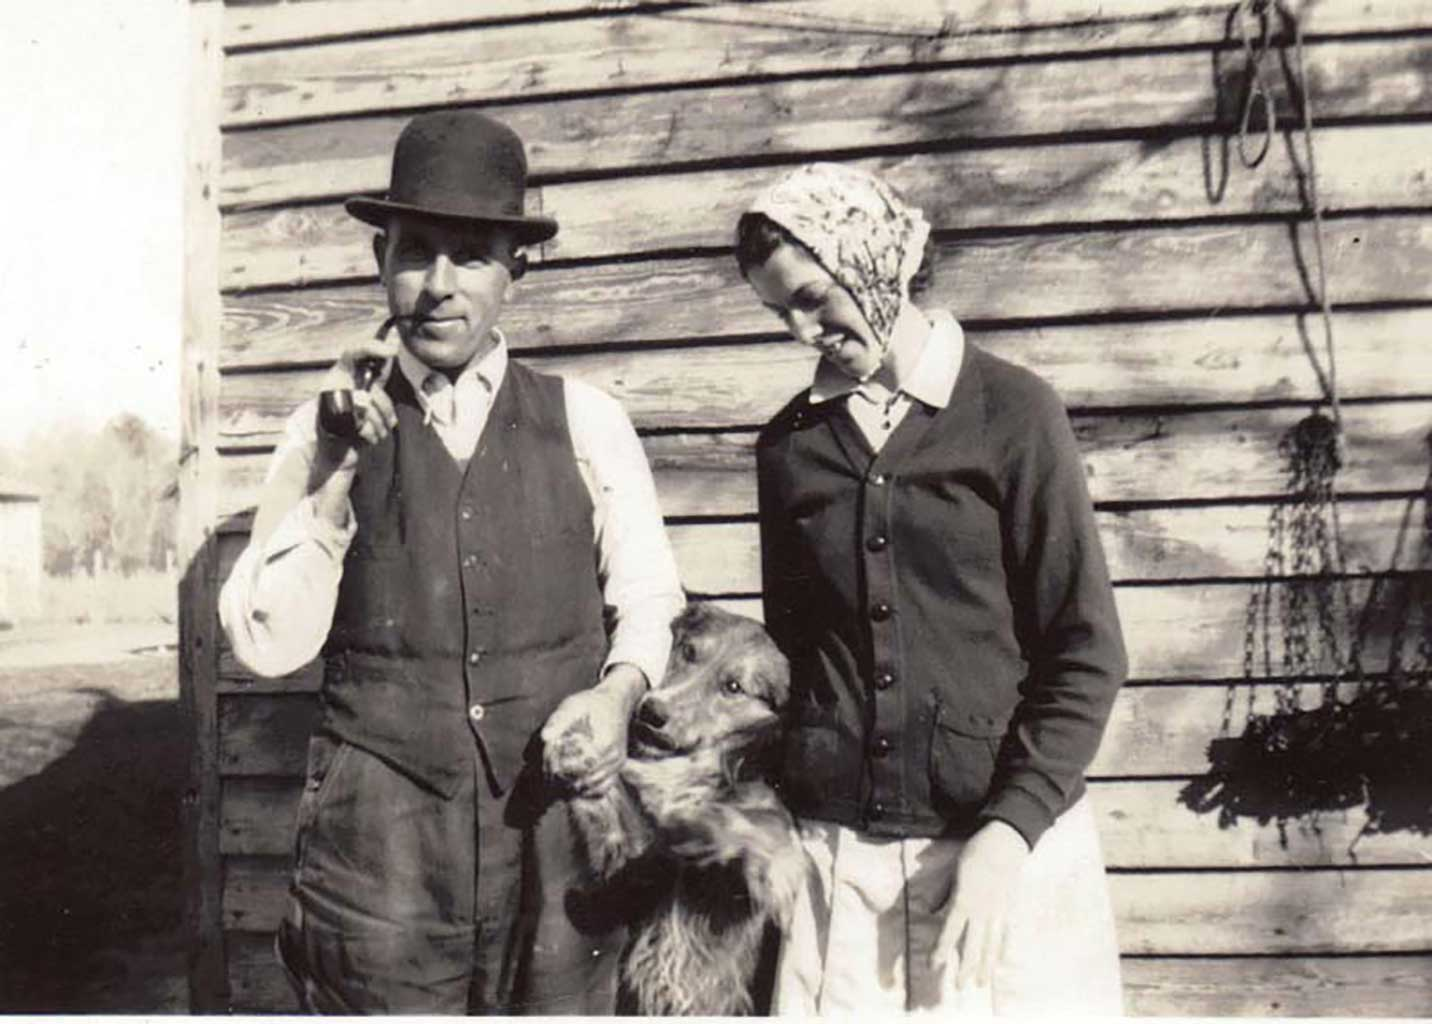 atlee-mary-martin-12-31-1940-notice-muskrat-traps-on-barn-earl-martin-photo